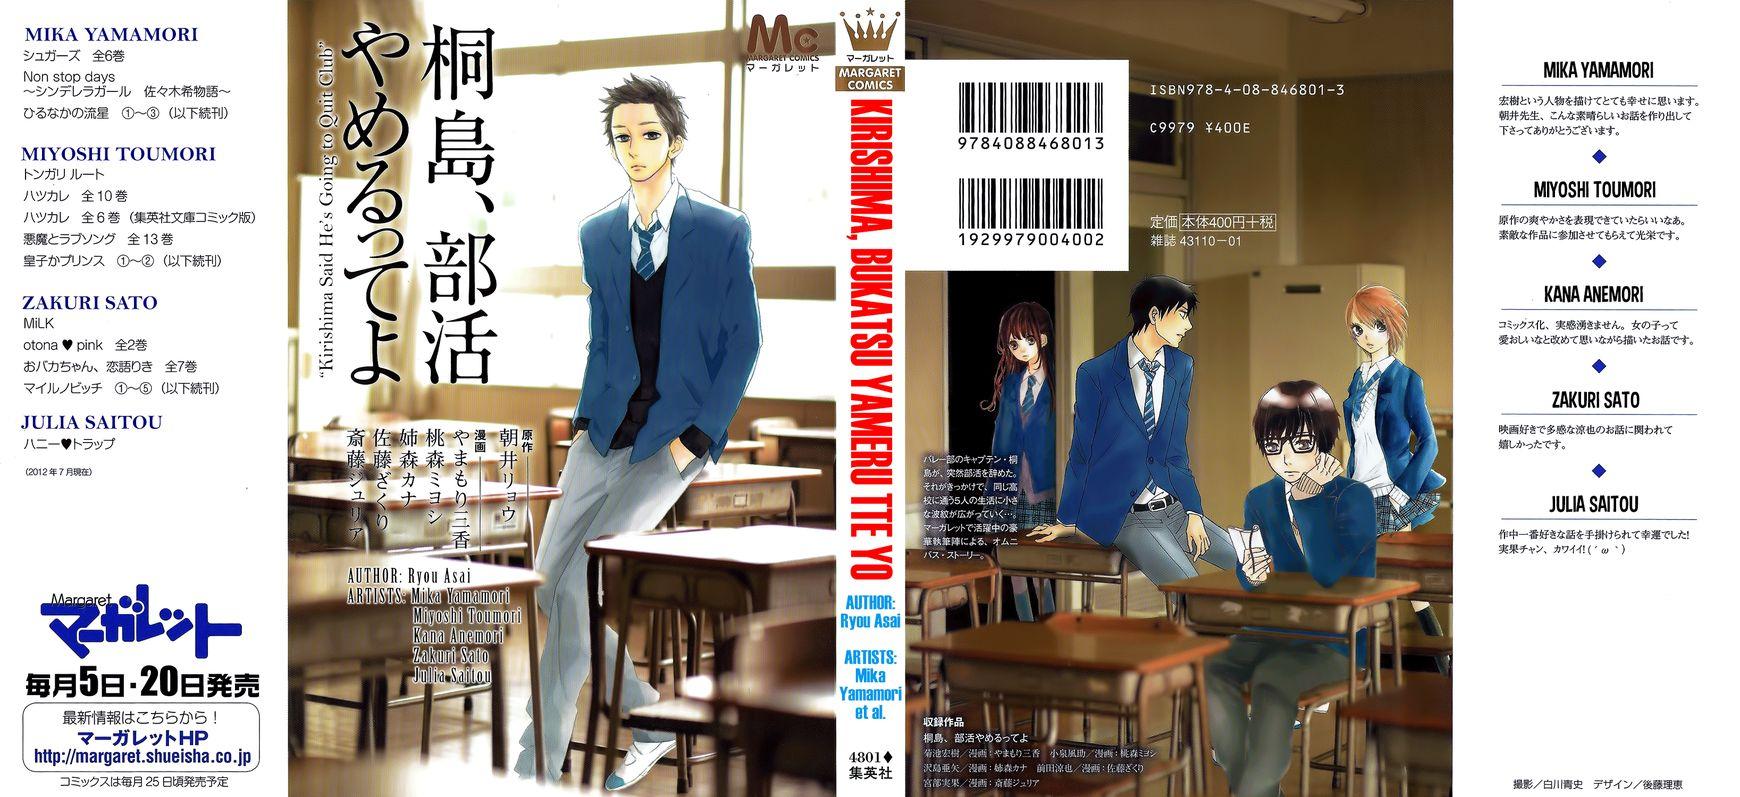 Kirishima, Bukatsu Yamerutte yo 1 Page 2